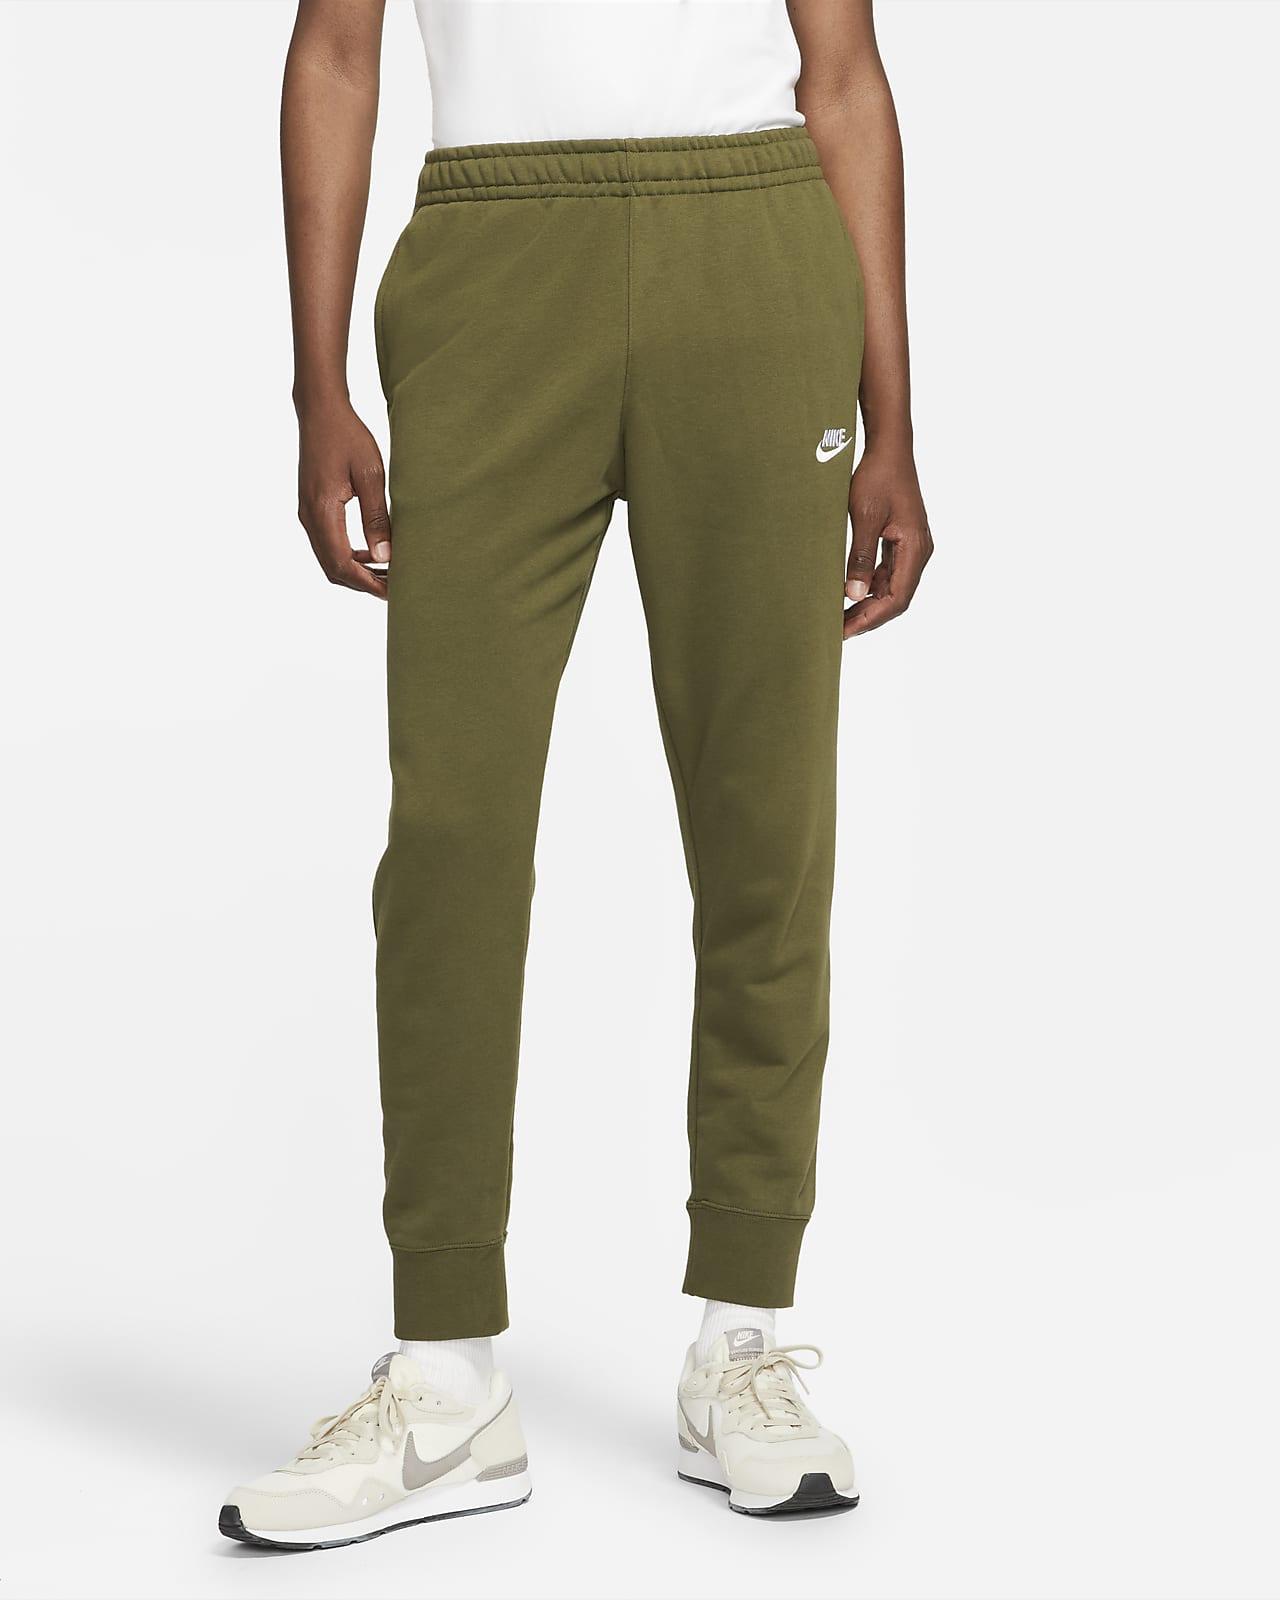 Jogger Nike Sportswear Club - Uomo